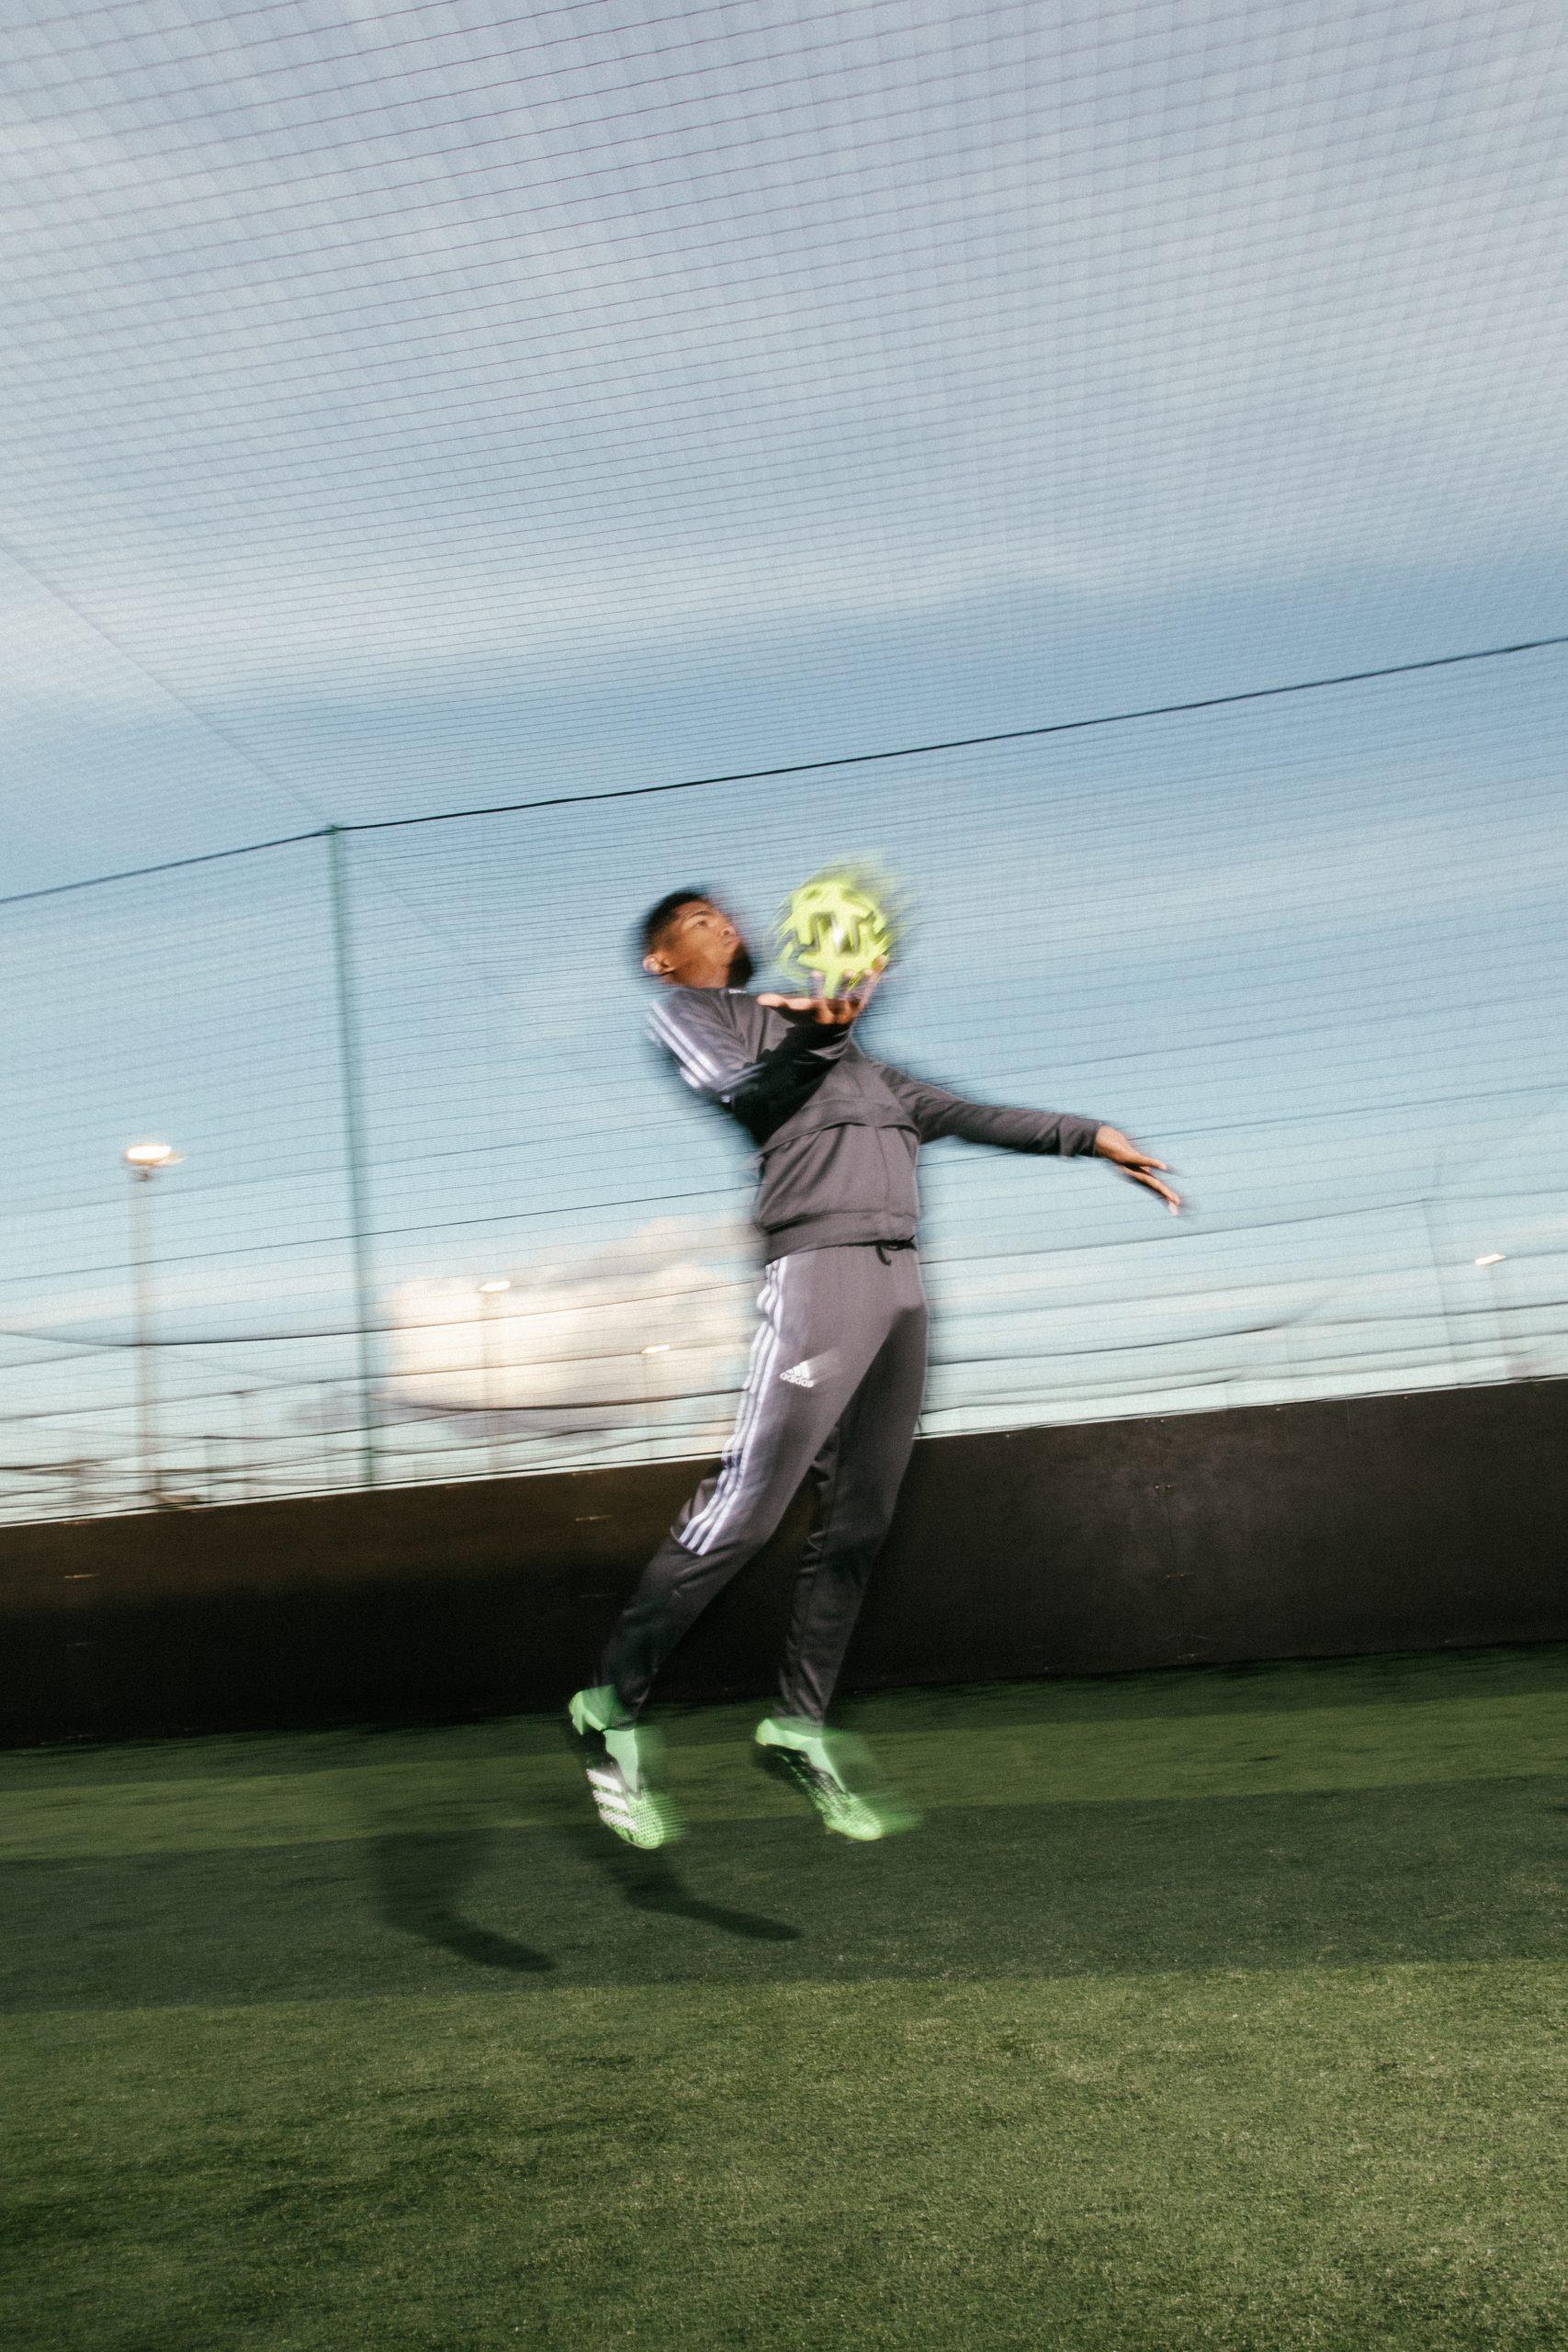 Adidas X Sports Direct | Precision to Blur Video Production Birmingham